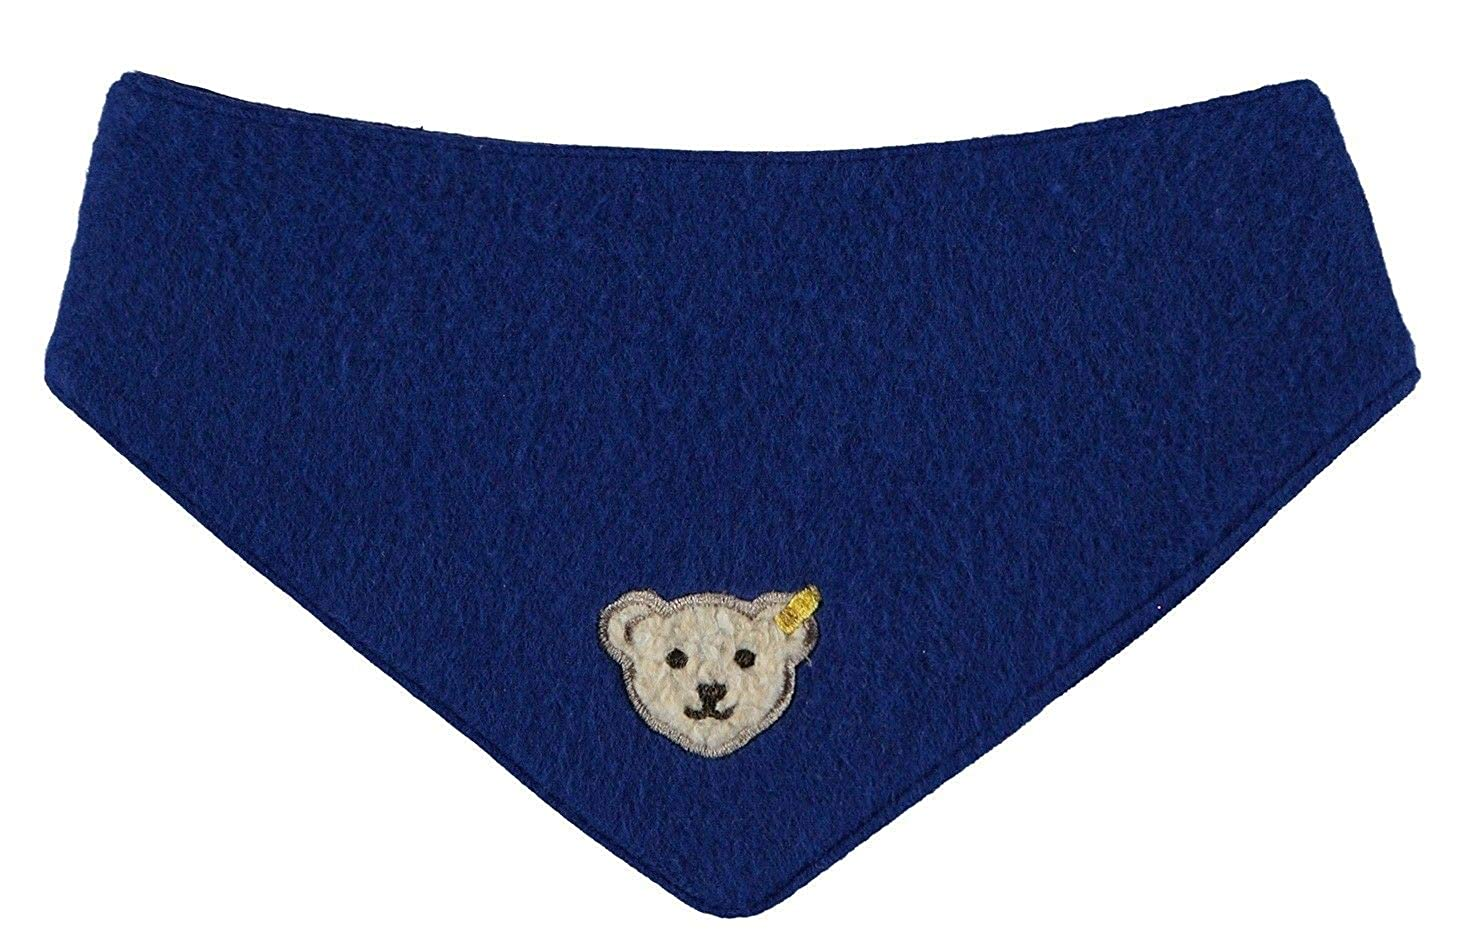 Steiff Baby - Jungen Halstuch Dreieckstuch Fleece Blau (Sodalite Blue 3136) One Size 6843810